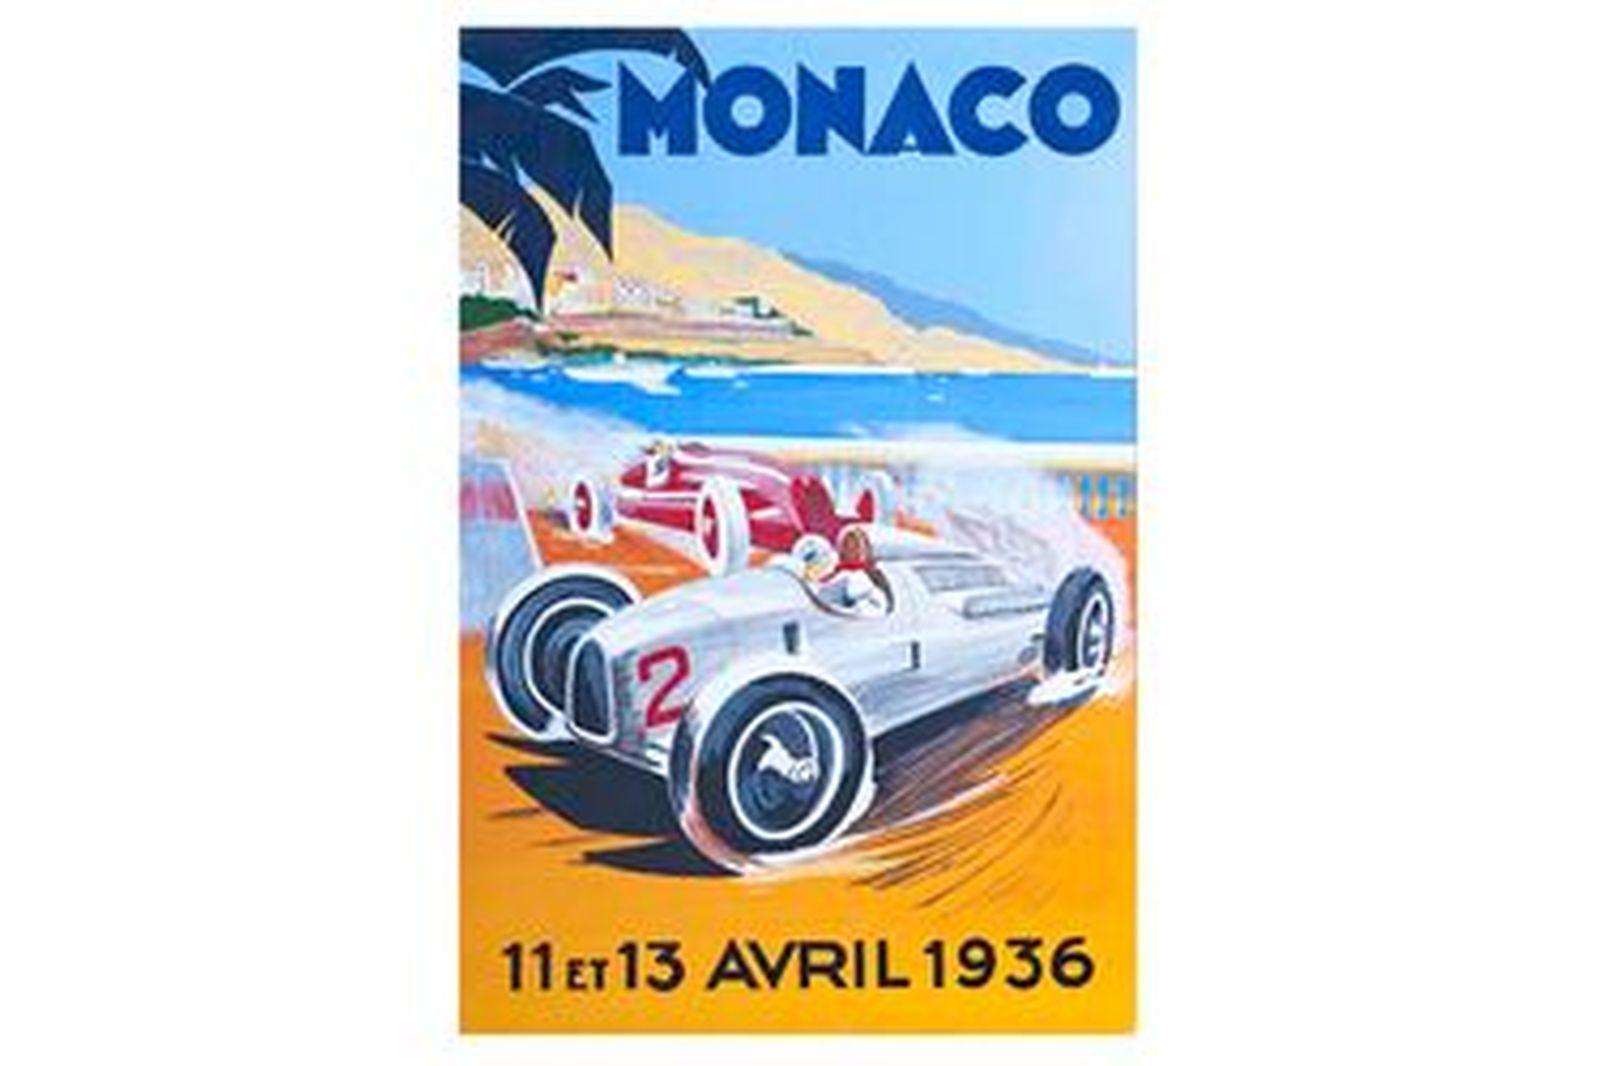 Quality Prints Framed - Monaco 11ET13 Avril 1936